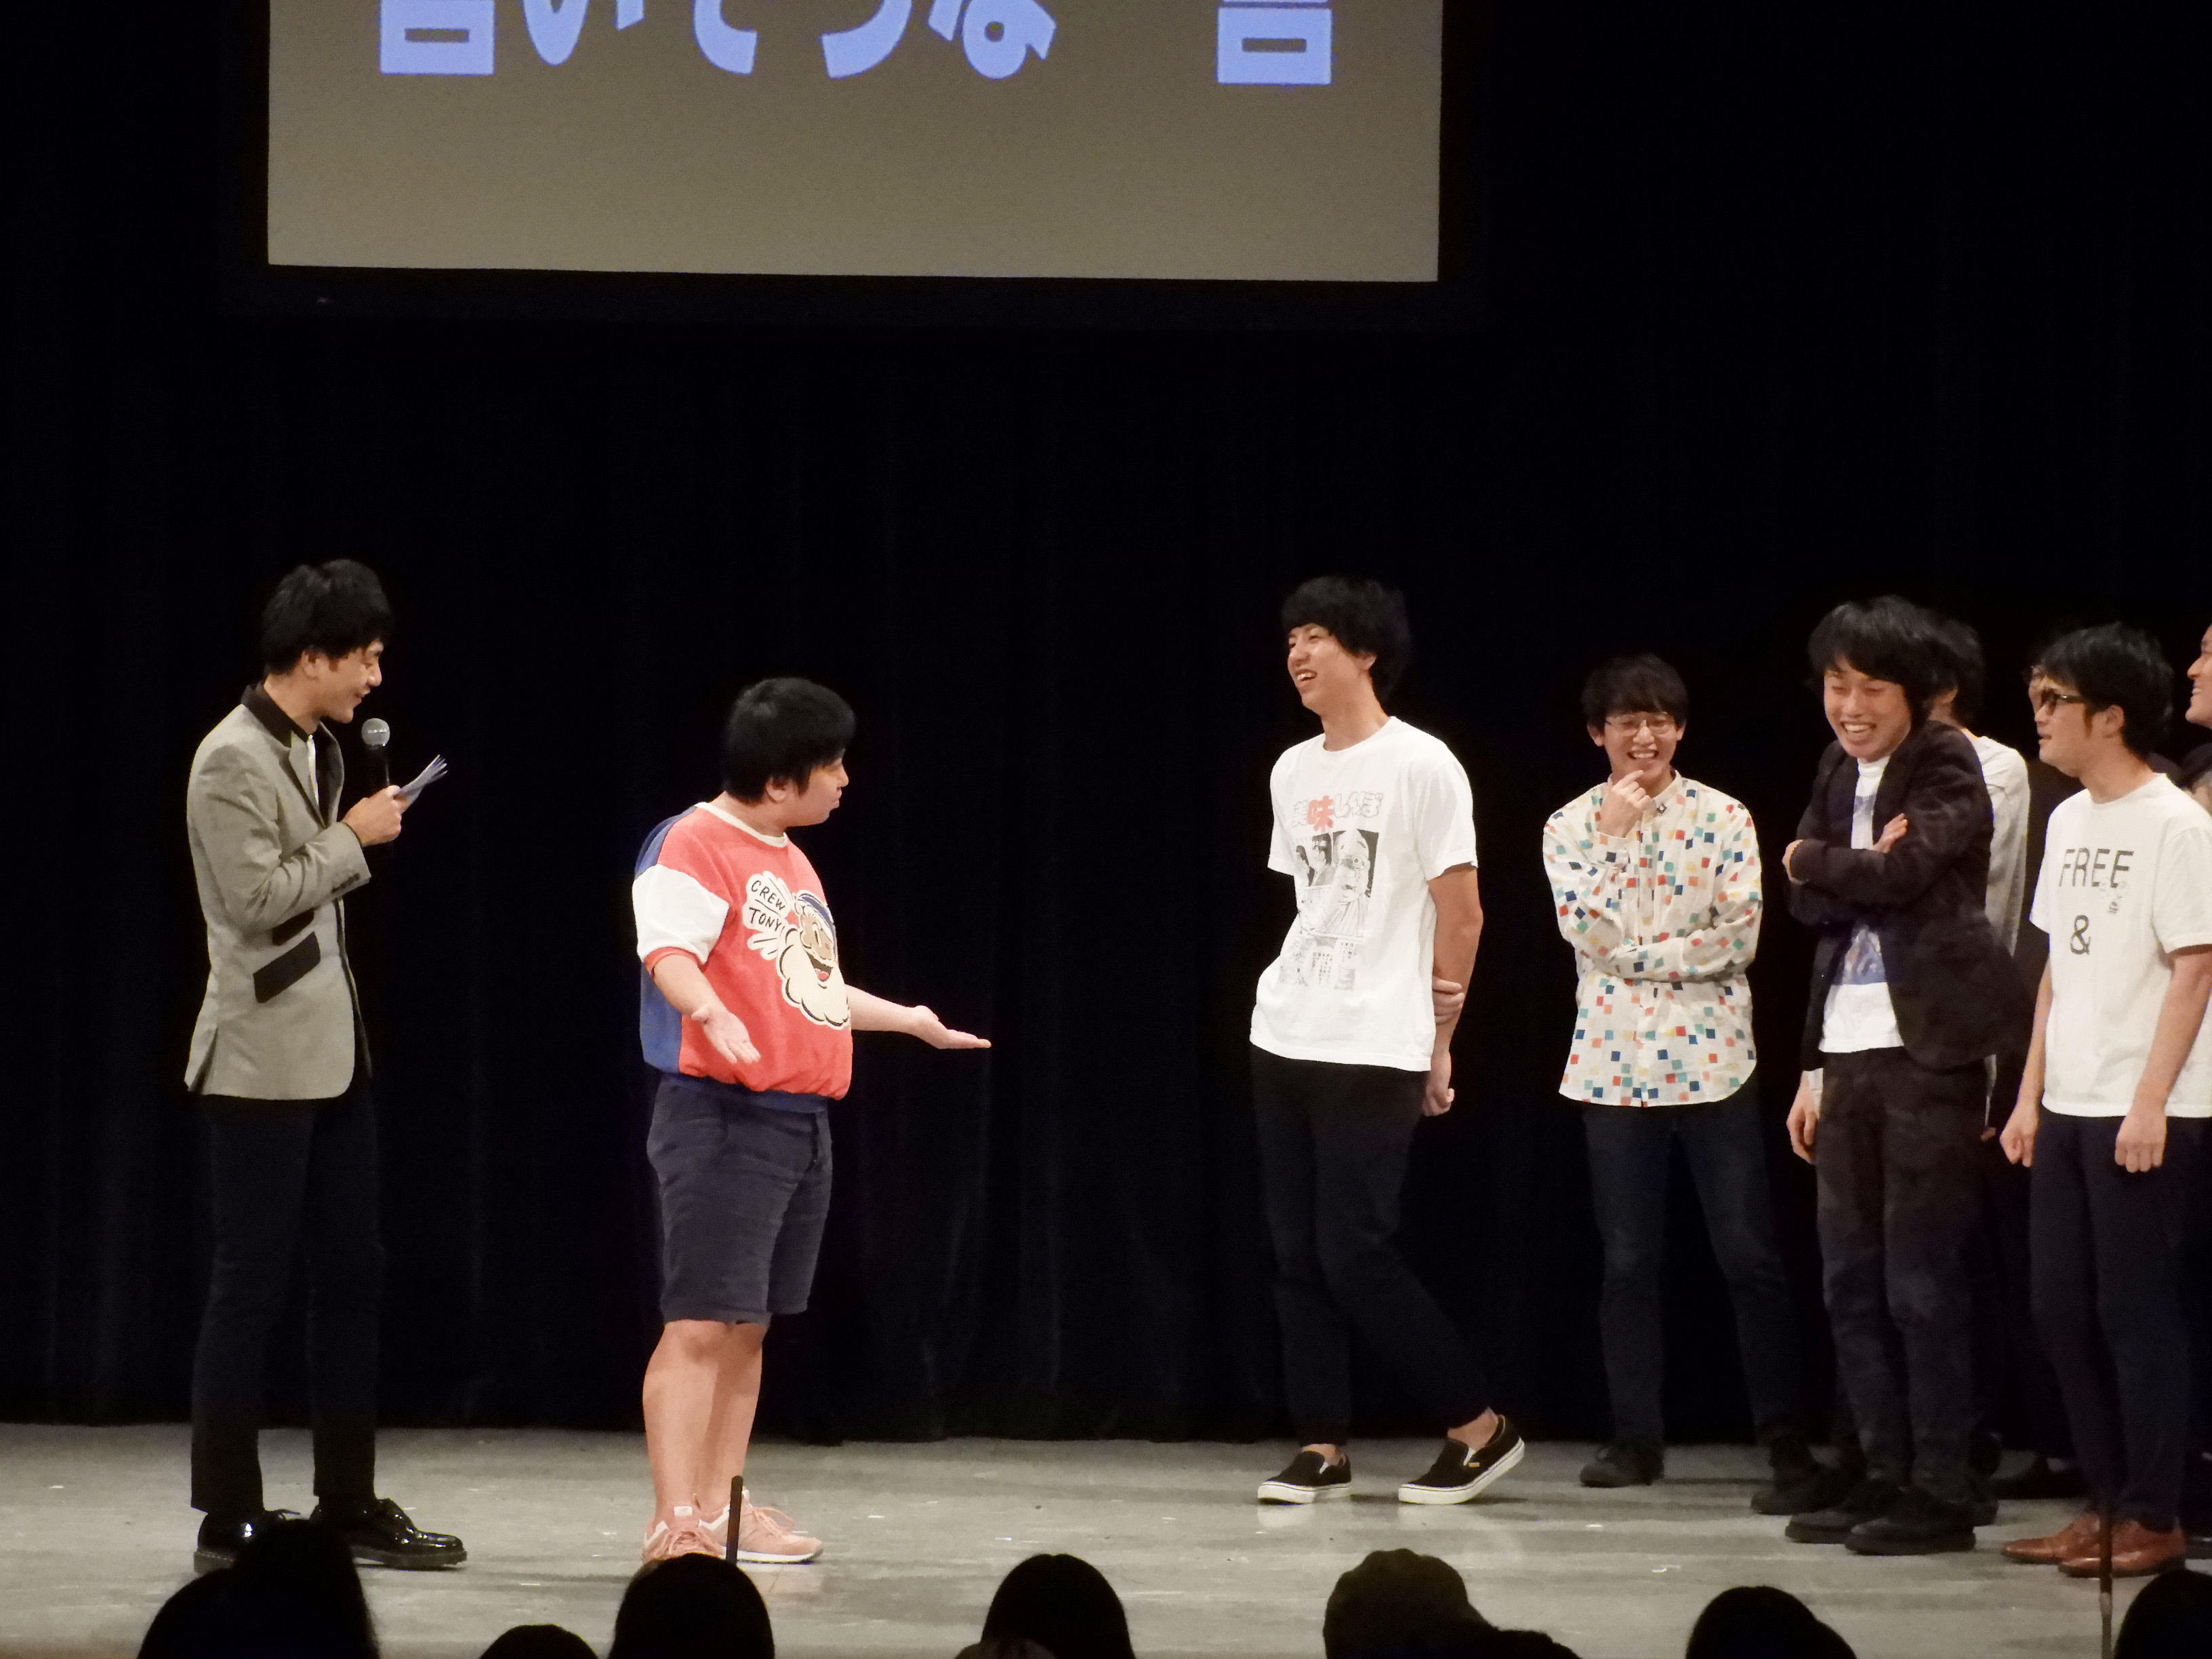 http://news.yoshimoto.co.jp/20180926120638-21355487fcc7d34a43b0cdf6a332fd6aff015244.jpg